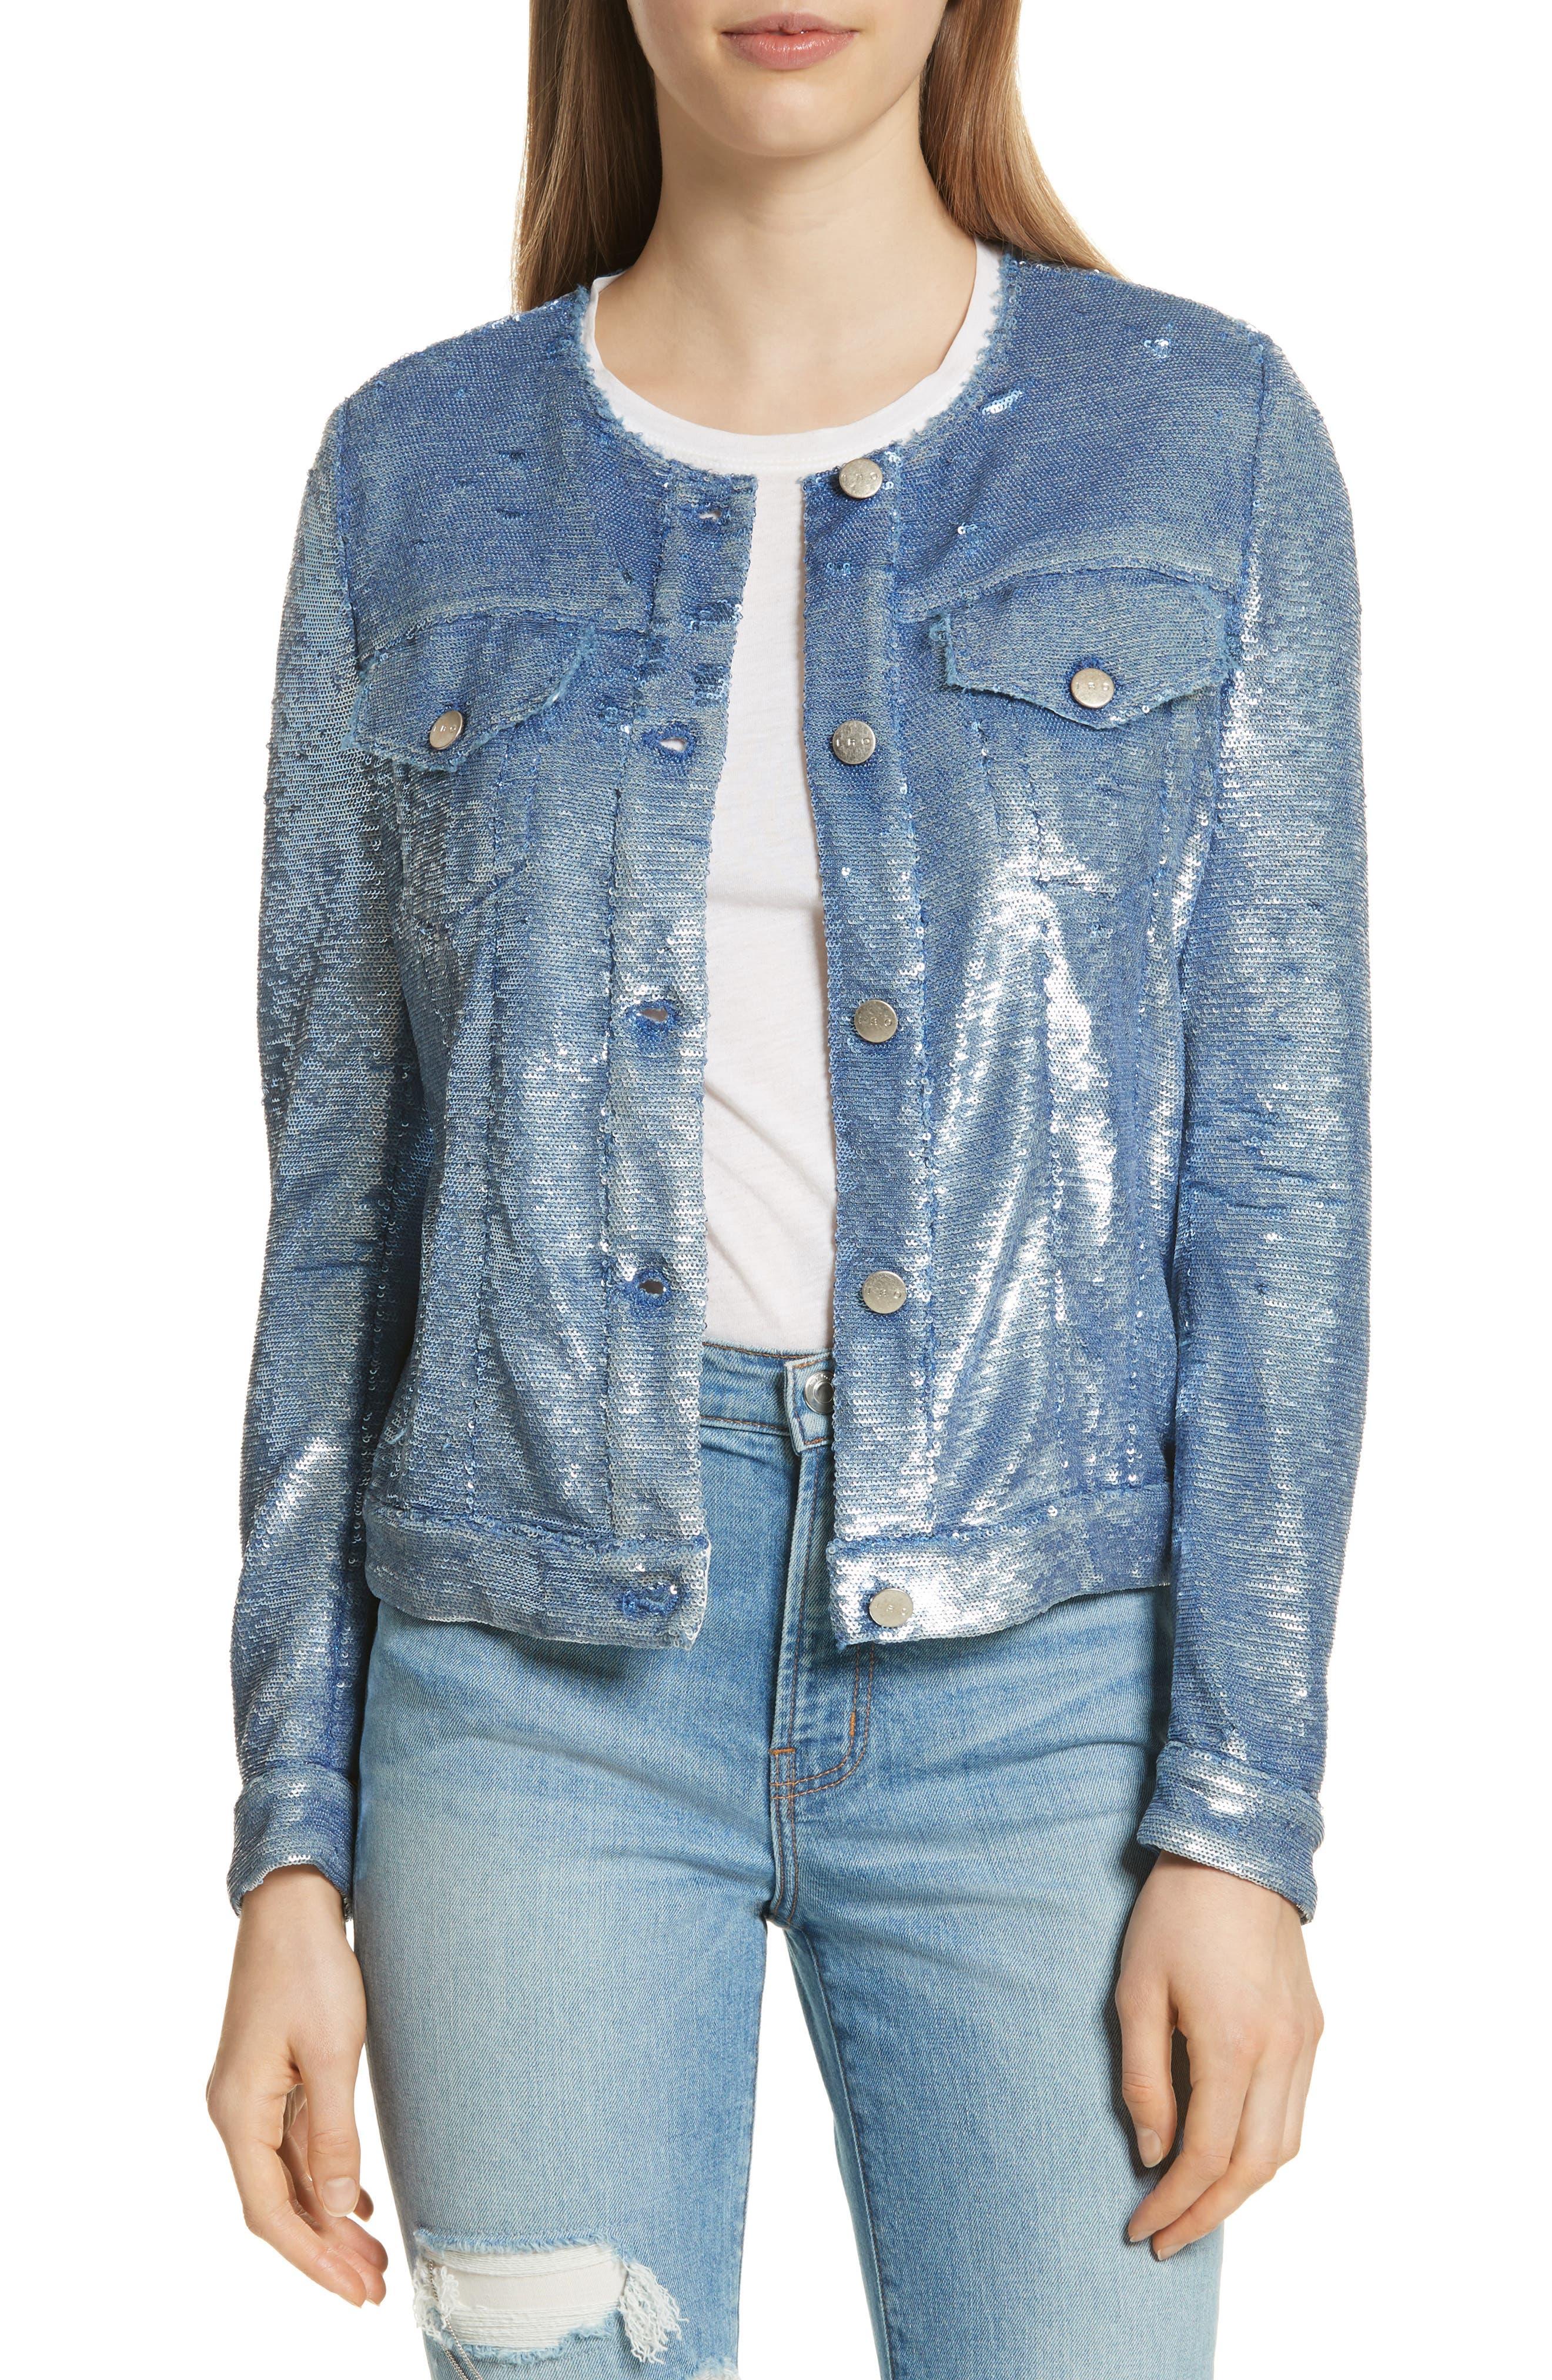 Dalome Sequin Jacket,                         Main,                         color, 454